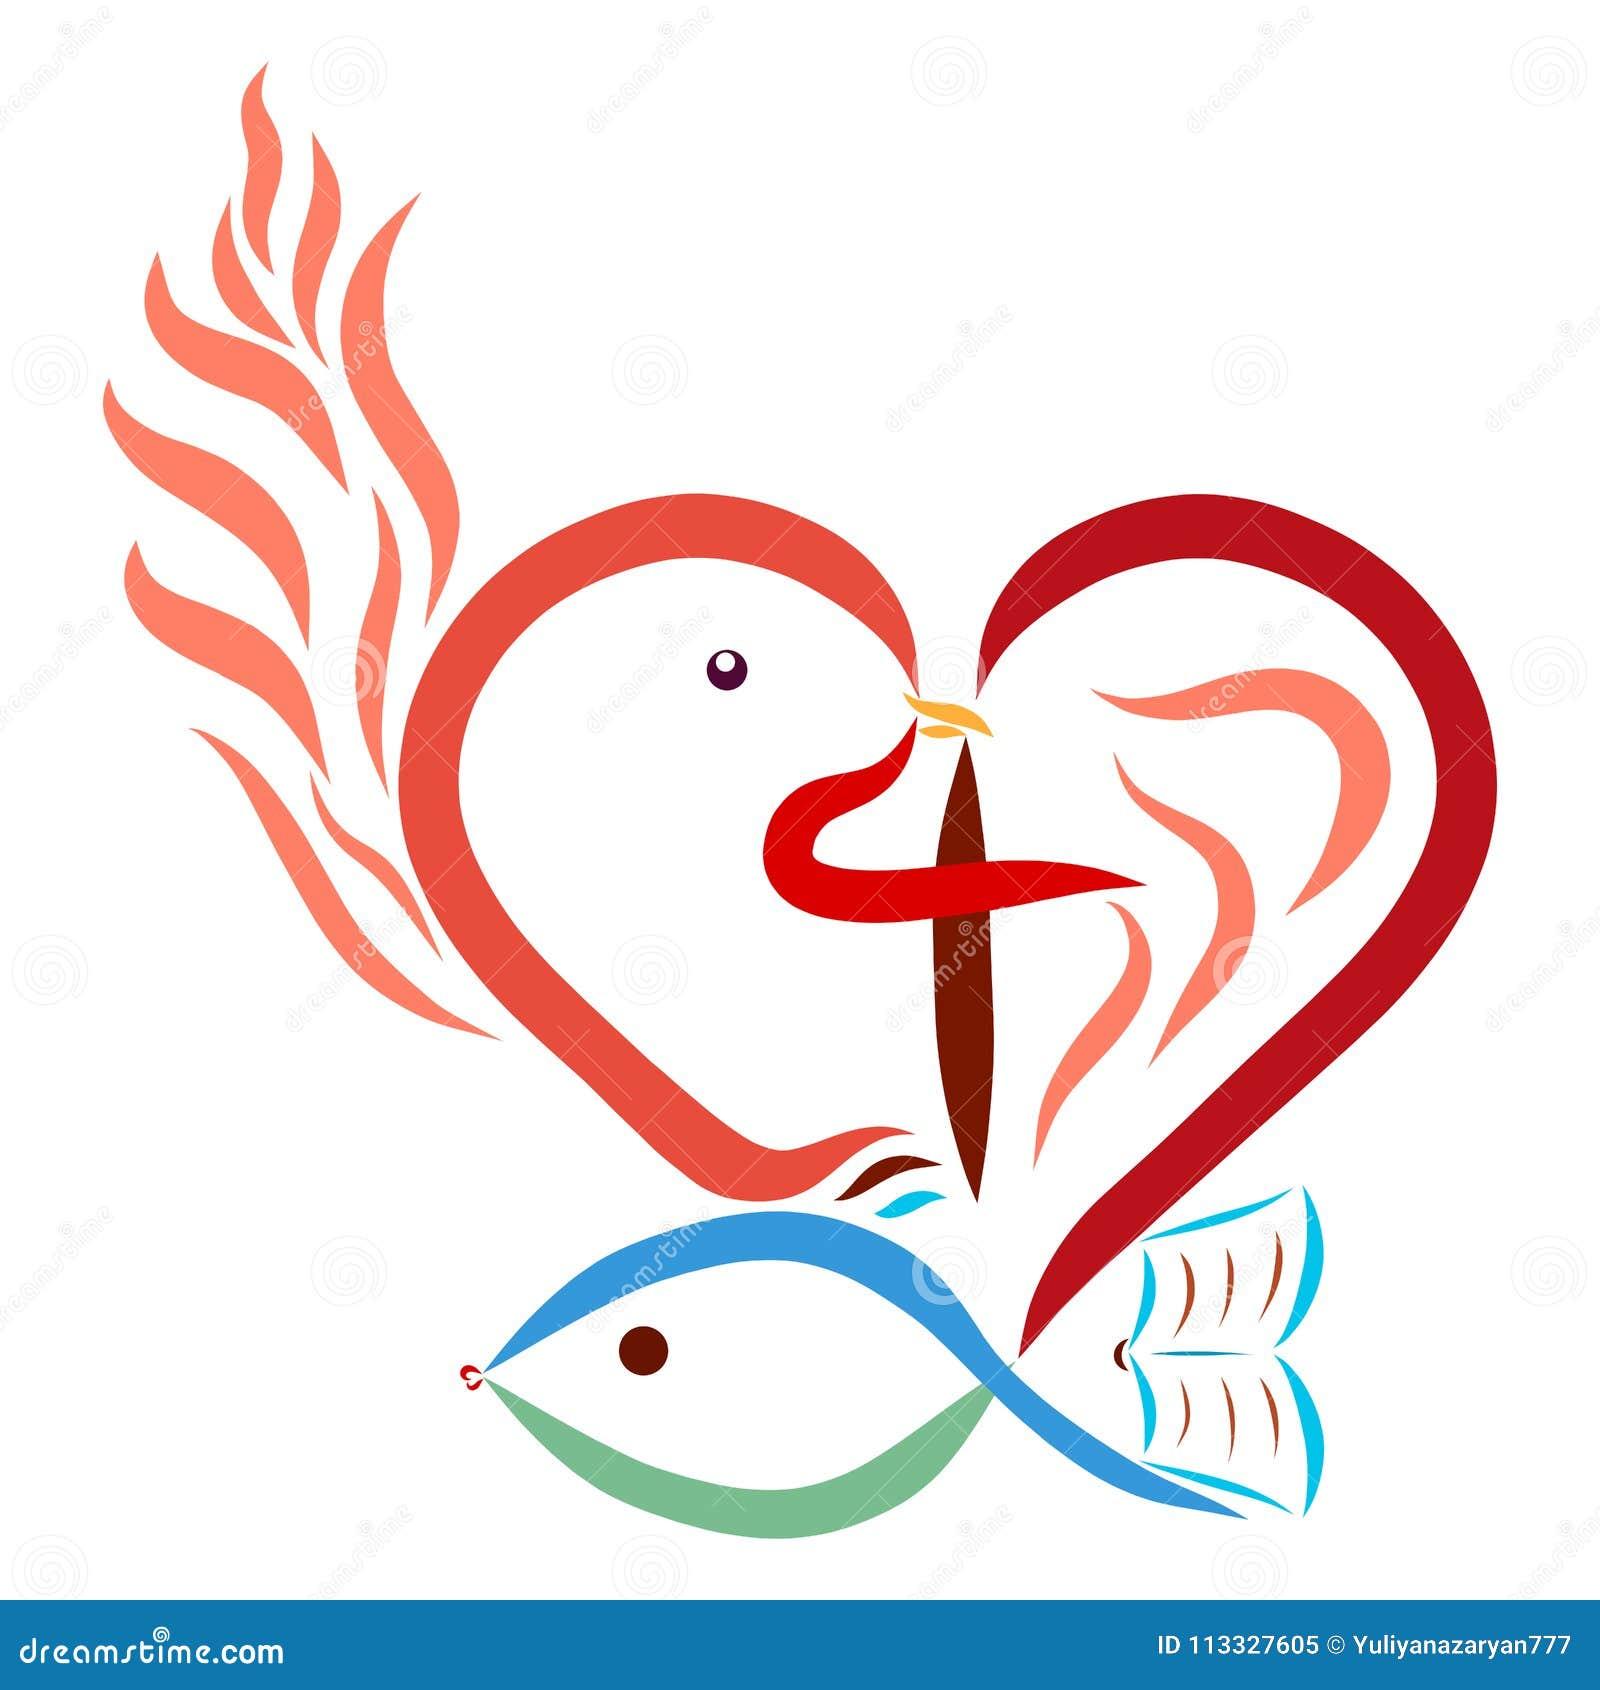 Christian Symbolism Heart Cross Dove Fish Flame Bible Stock ...